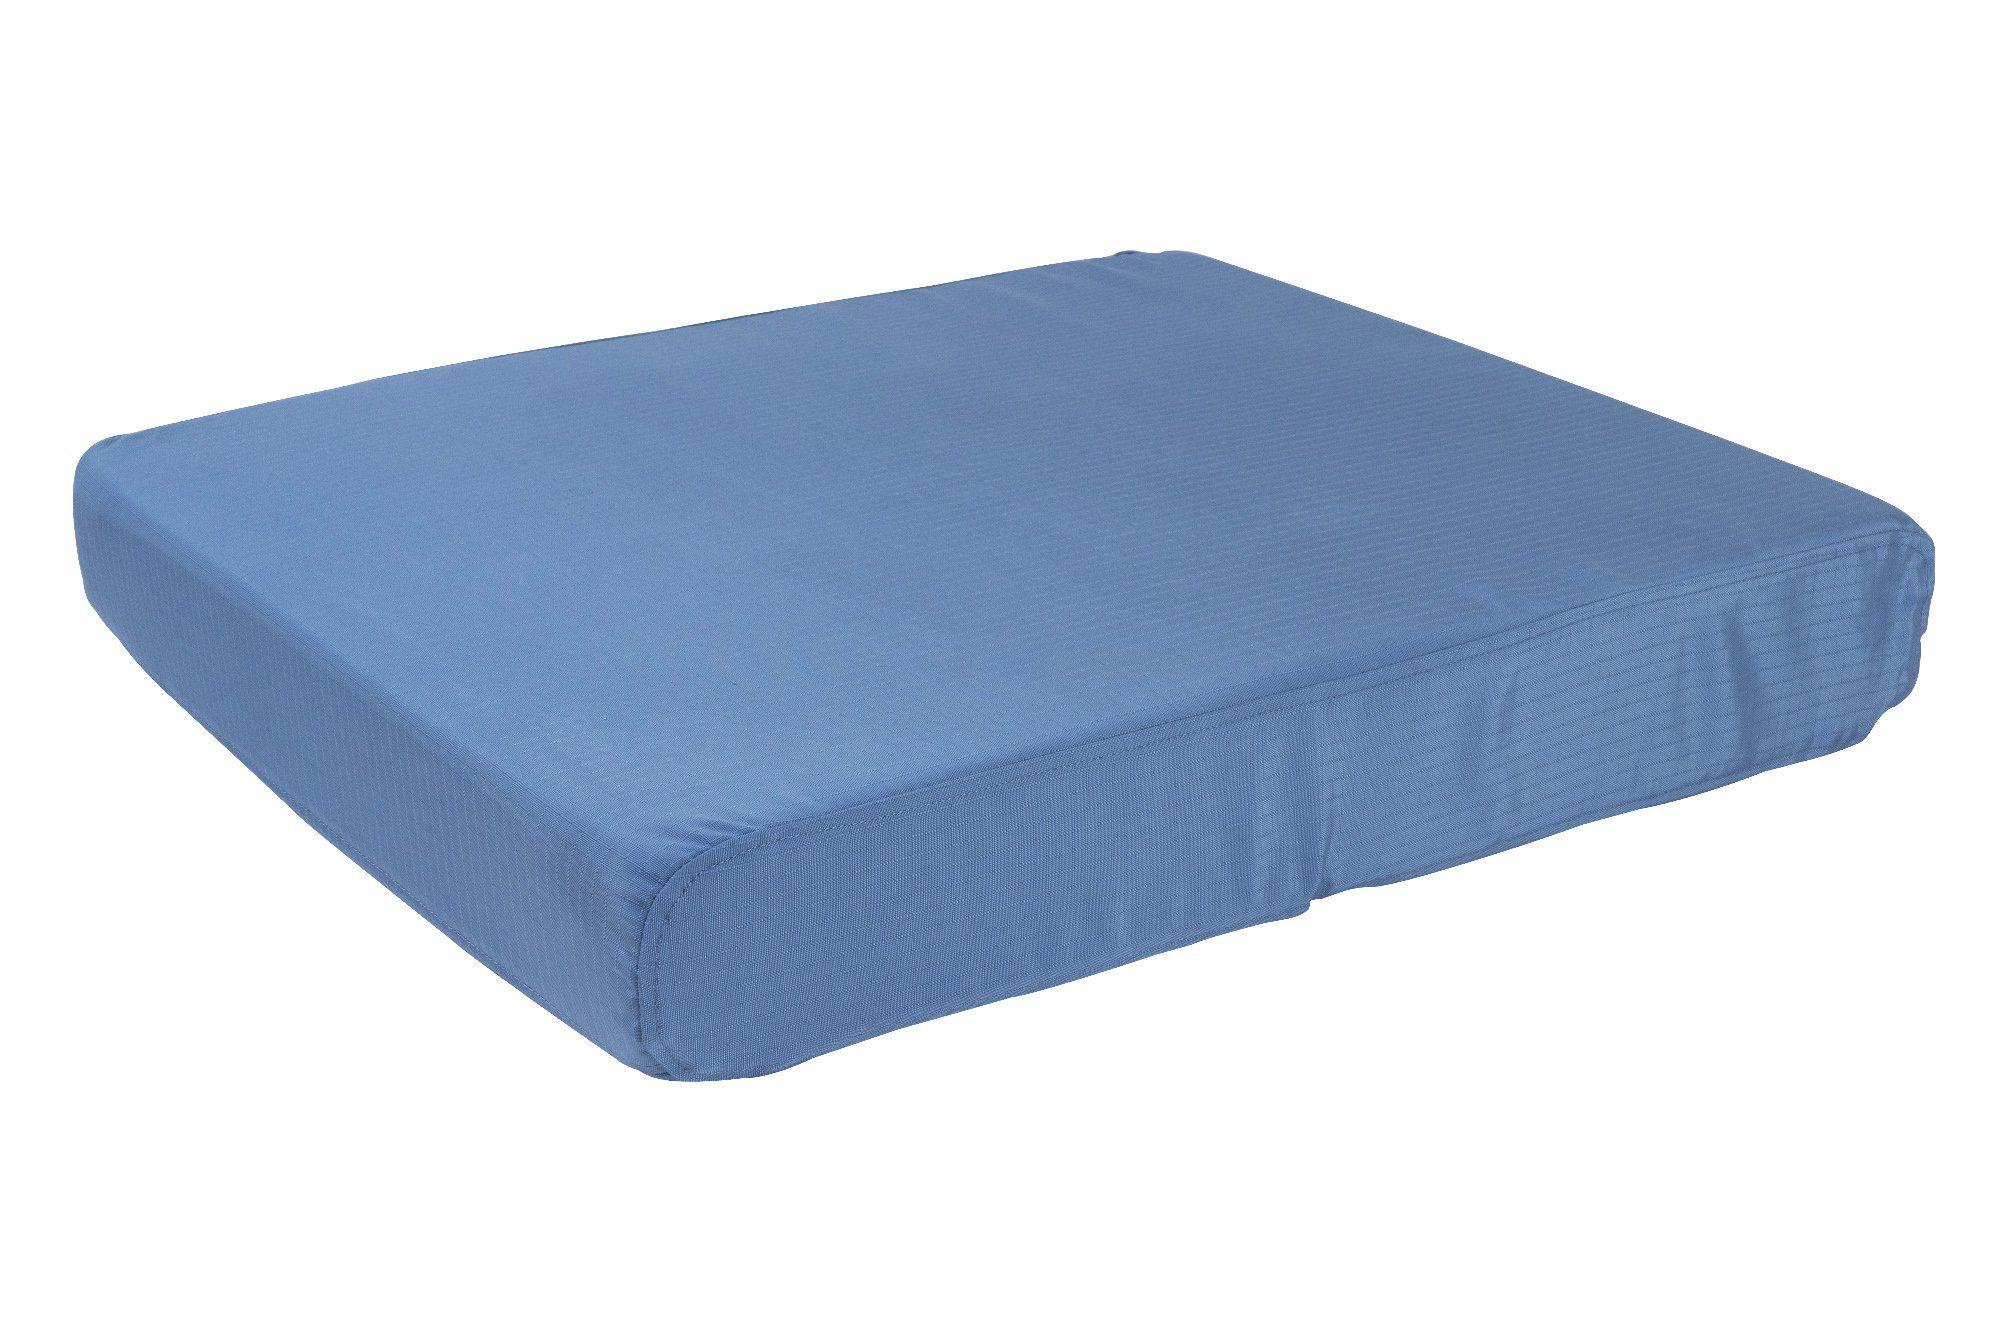 K9 Ballistics Orthopedic TUFF Bed Blue Large 34x40x5